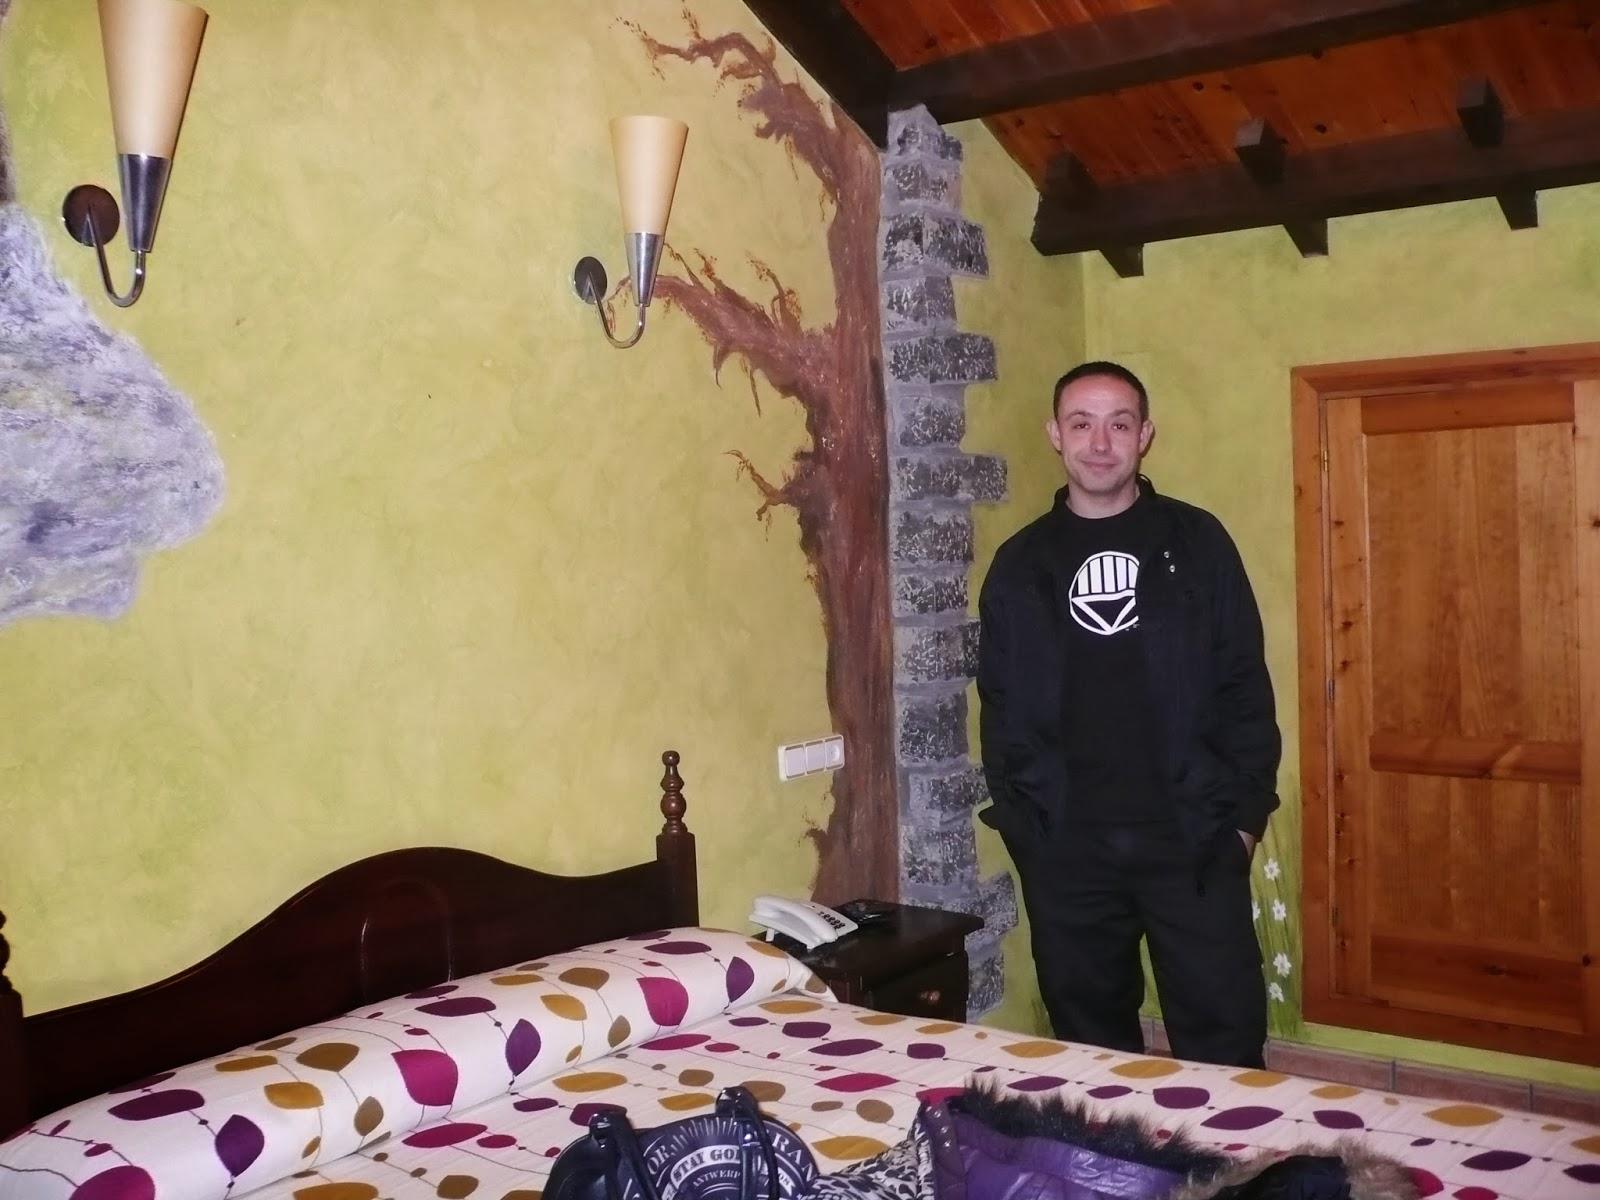 http://www.hotelcostaderodiles.com/